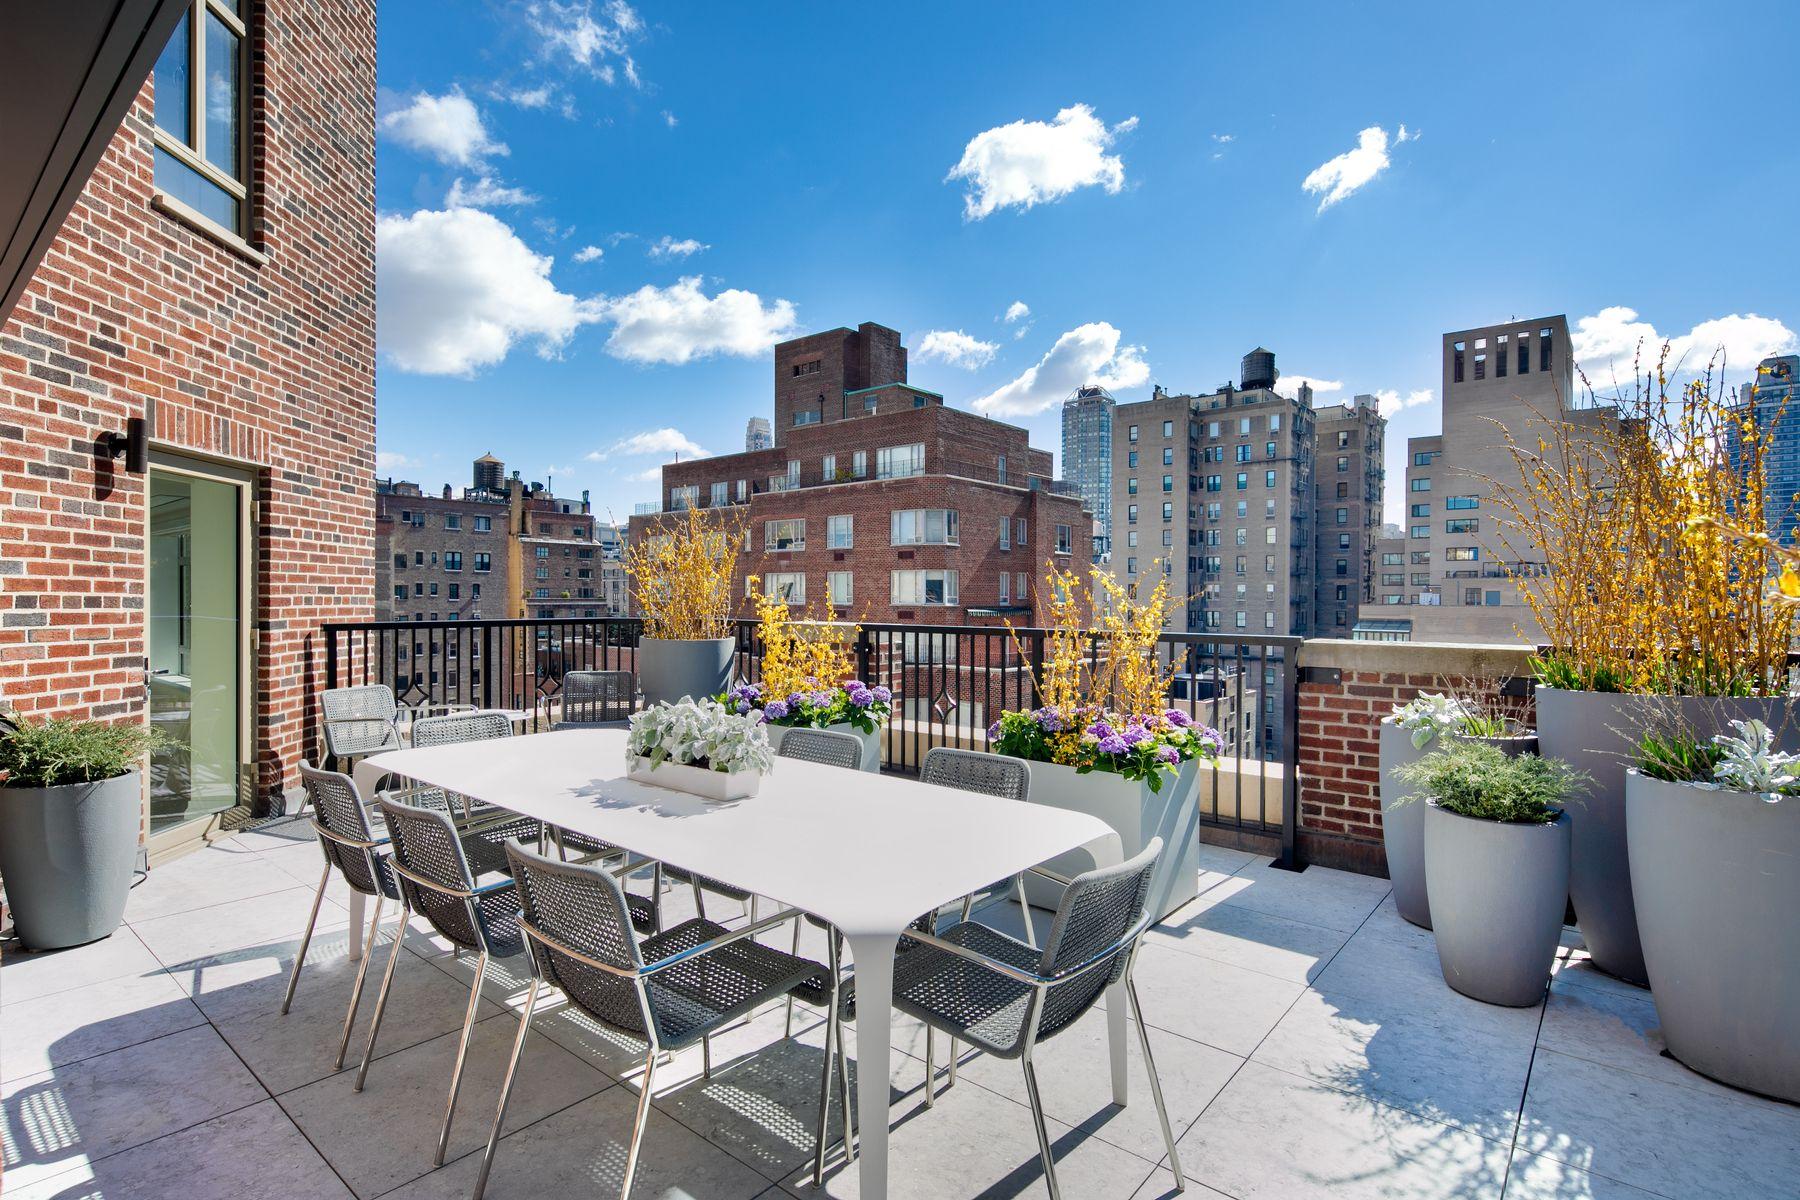 Apartments 為 出售 在 21 East 61st Street, Apt. 14A 21 East 61st Street, Apt 14A, 纽约, 纽约 10065 美國